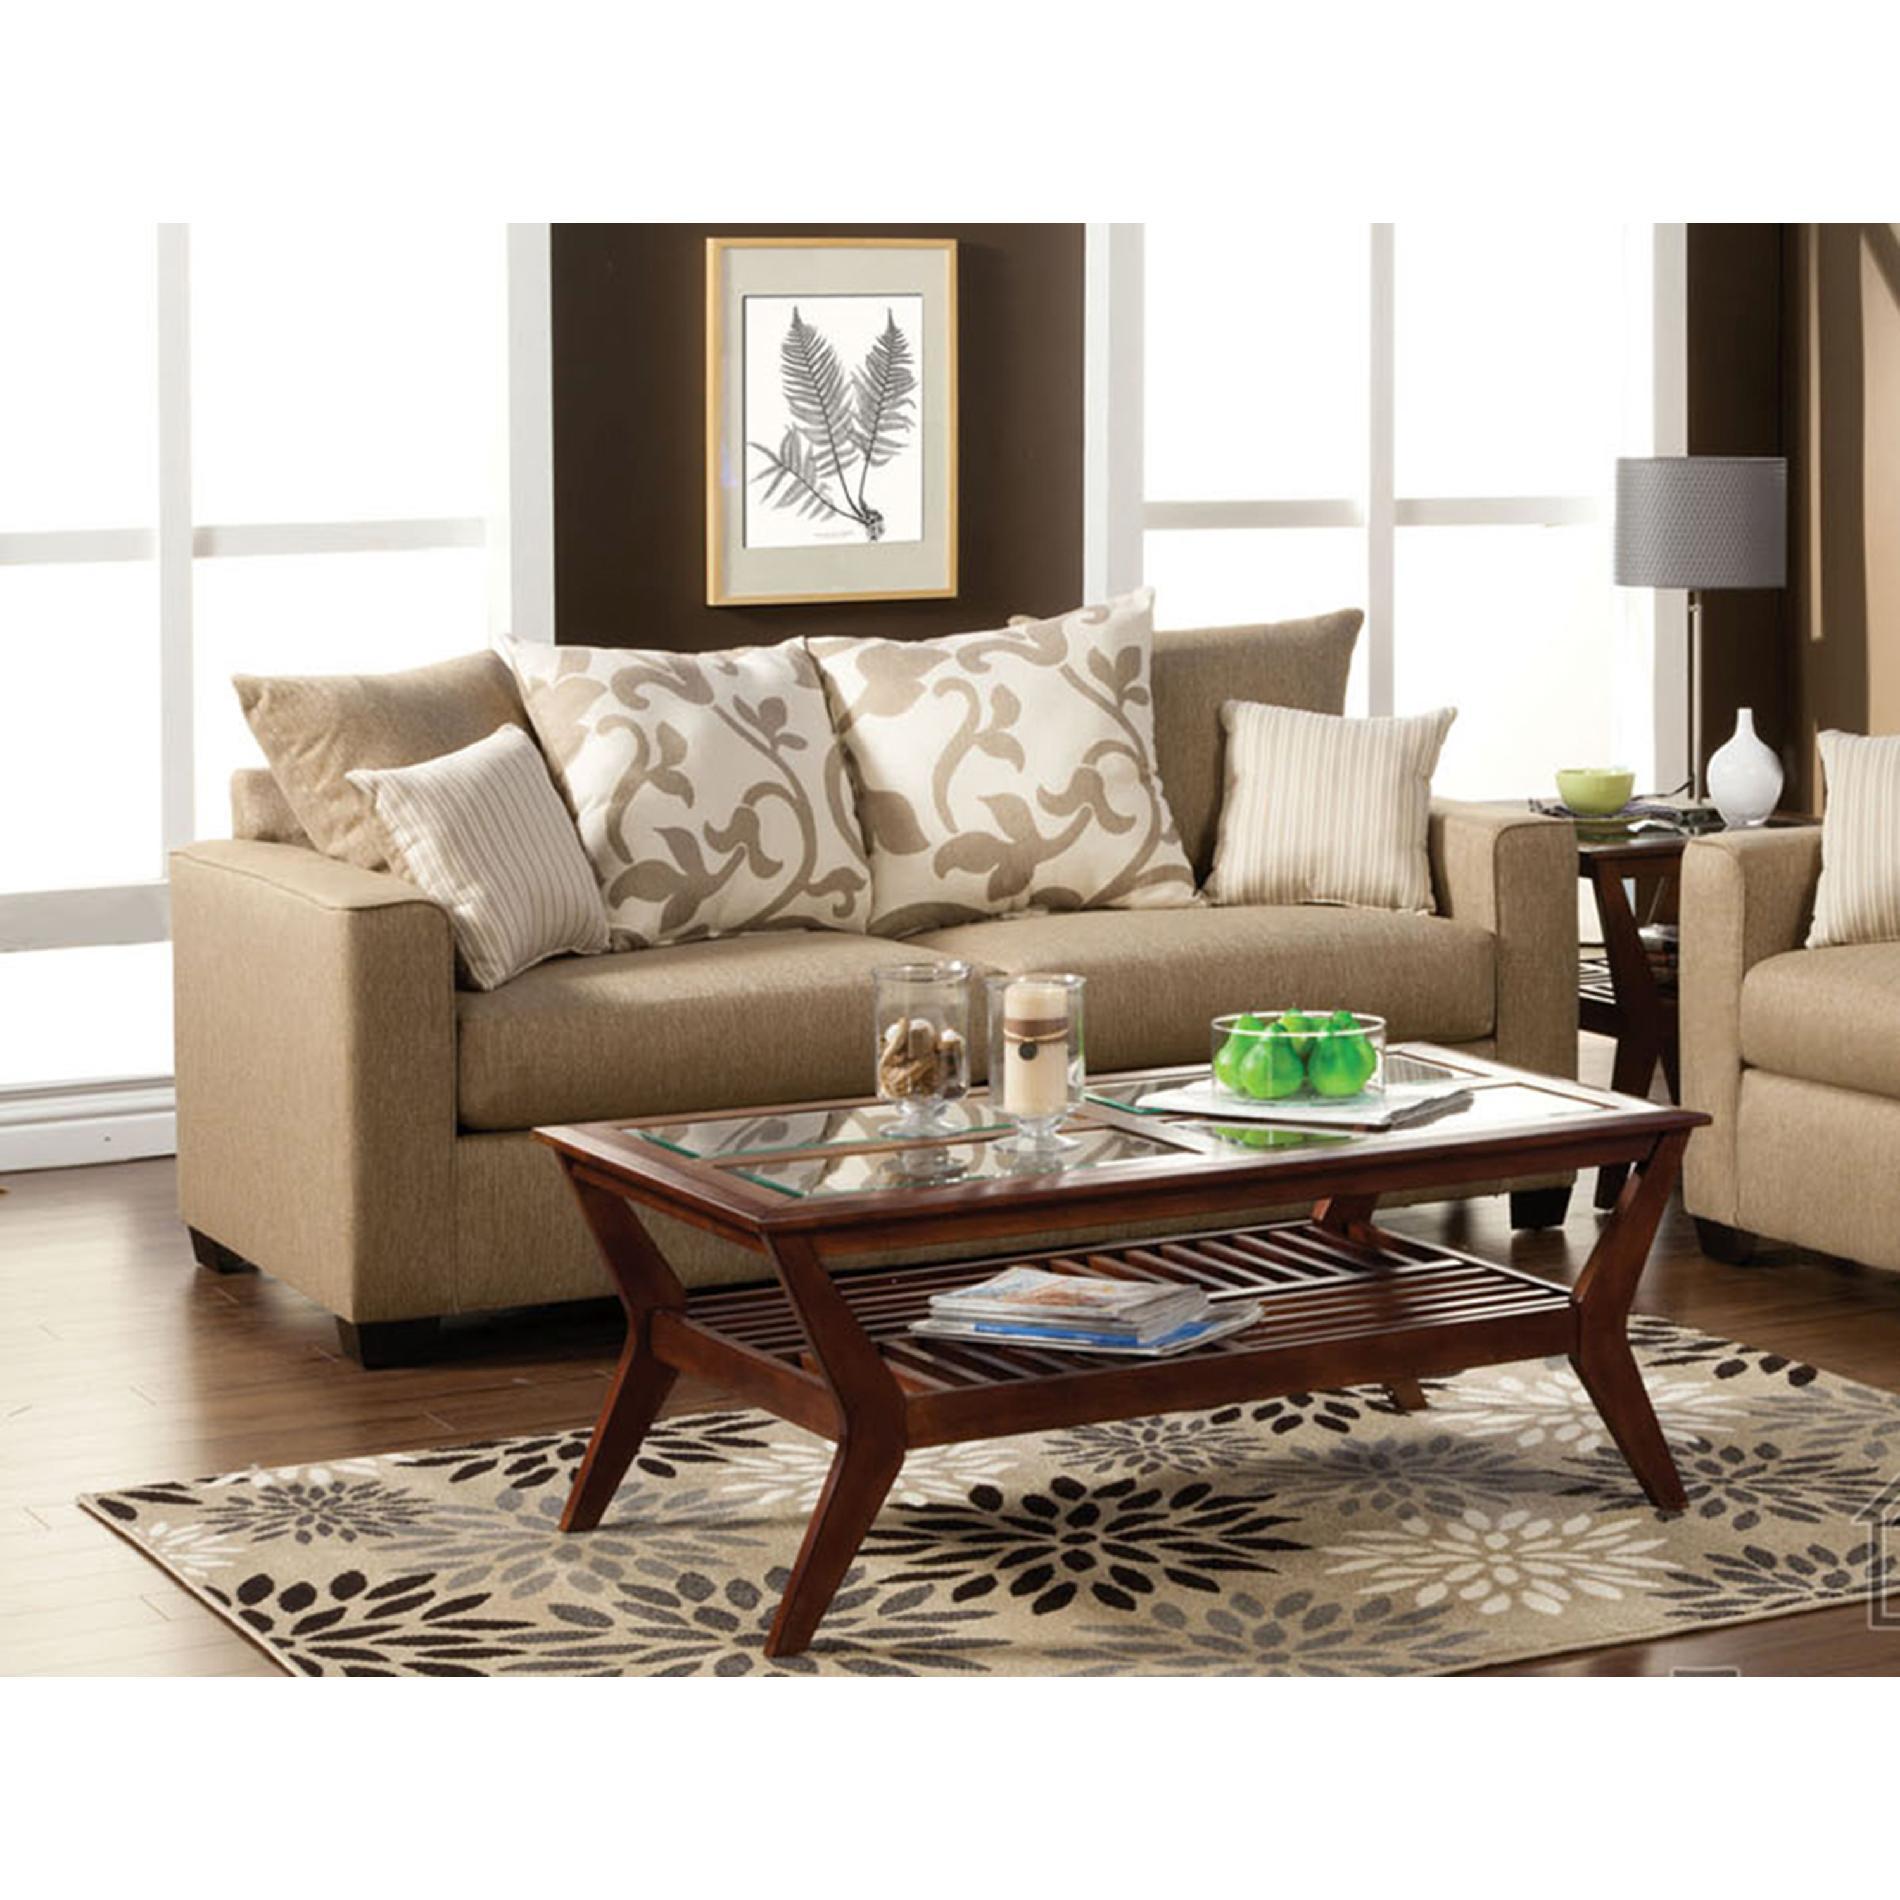 Venetian Worldwide Colebrook Beige Sofa With Pillows